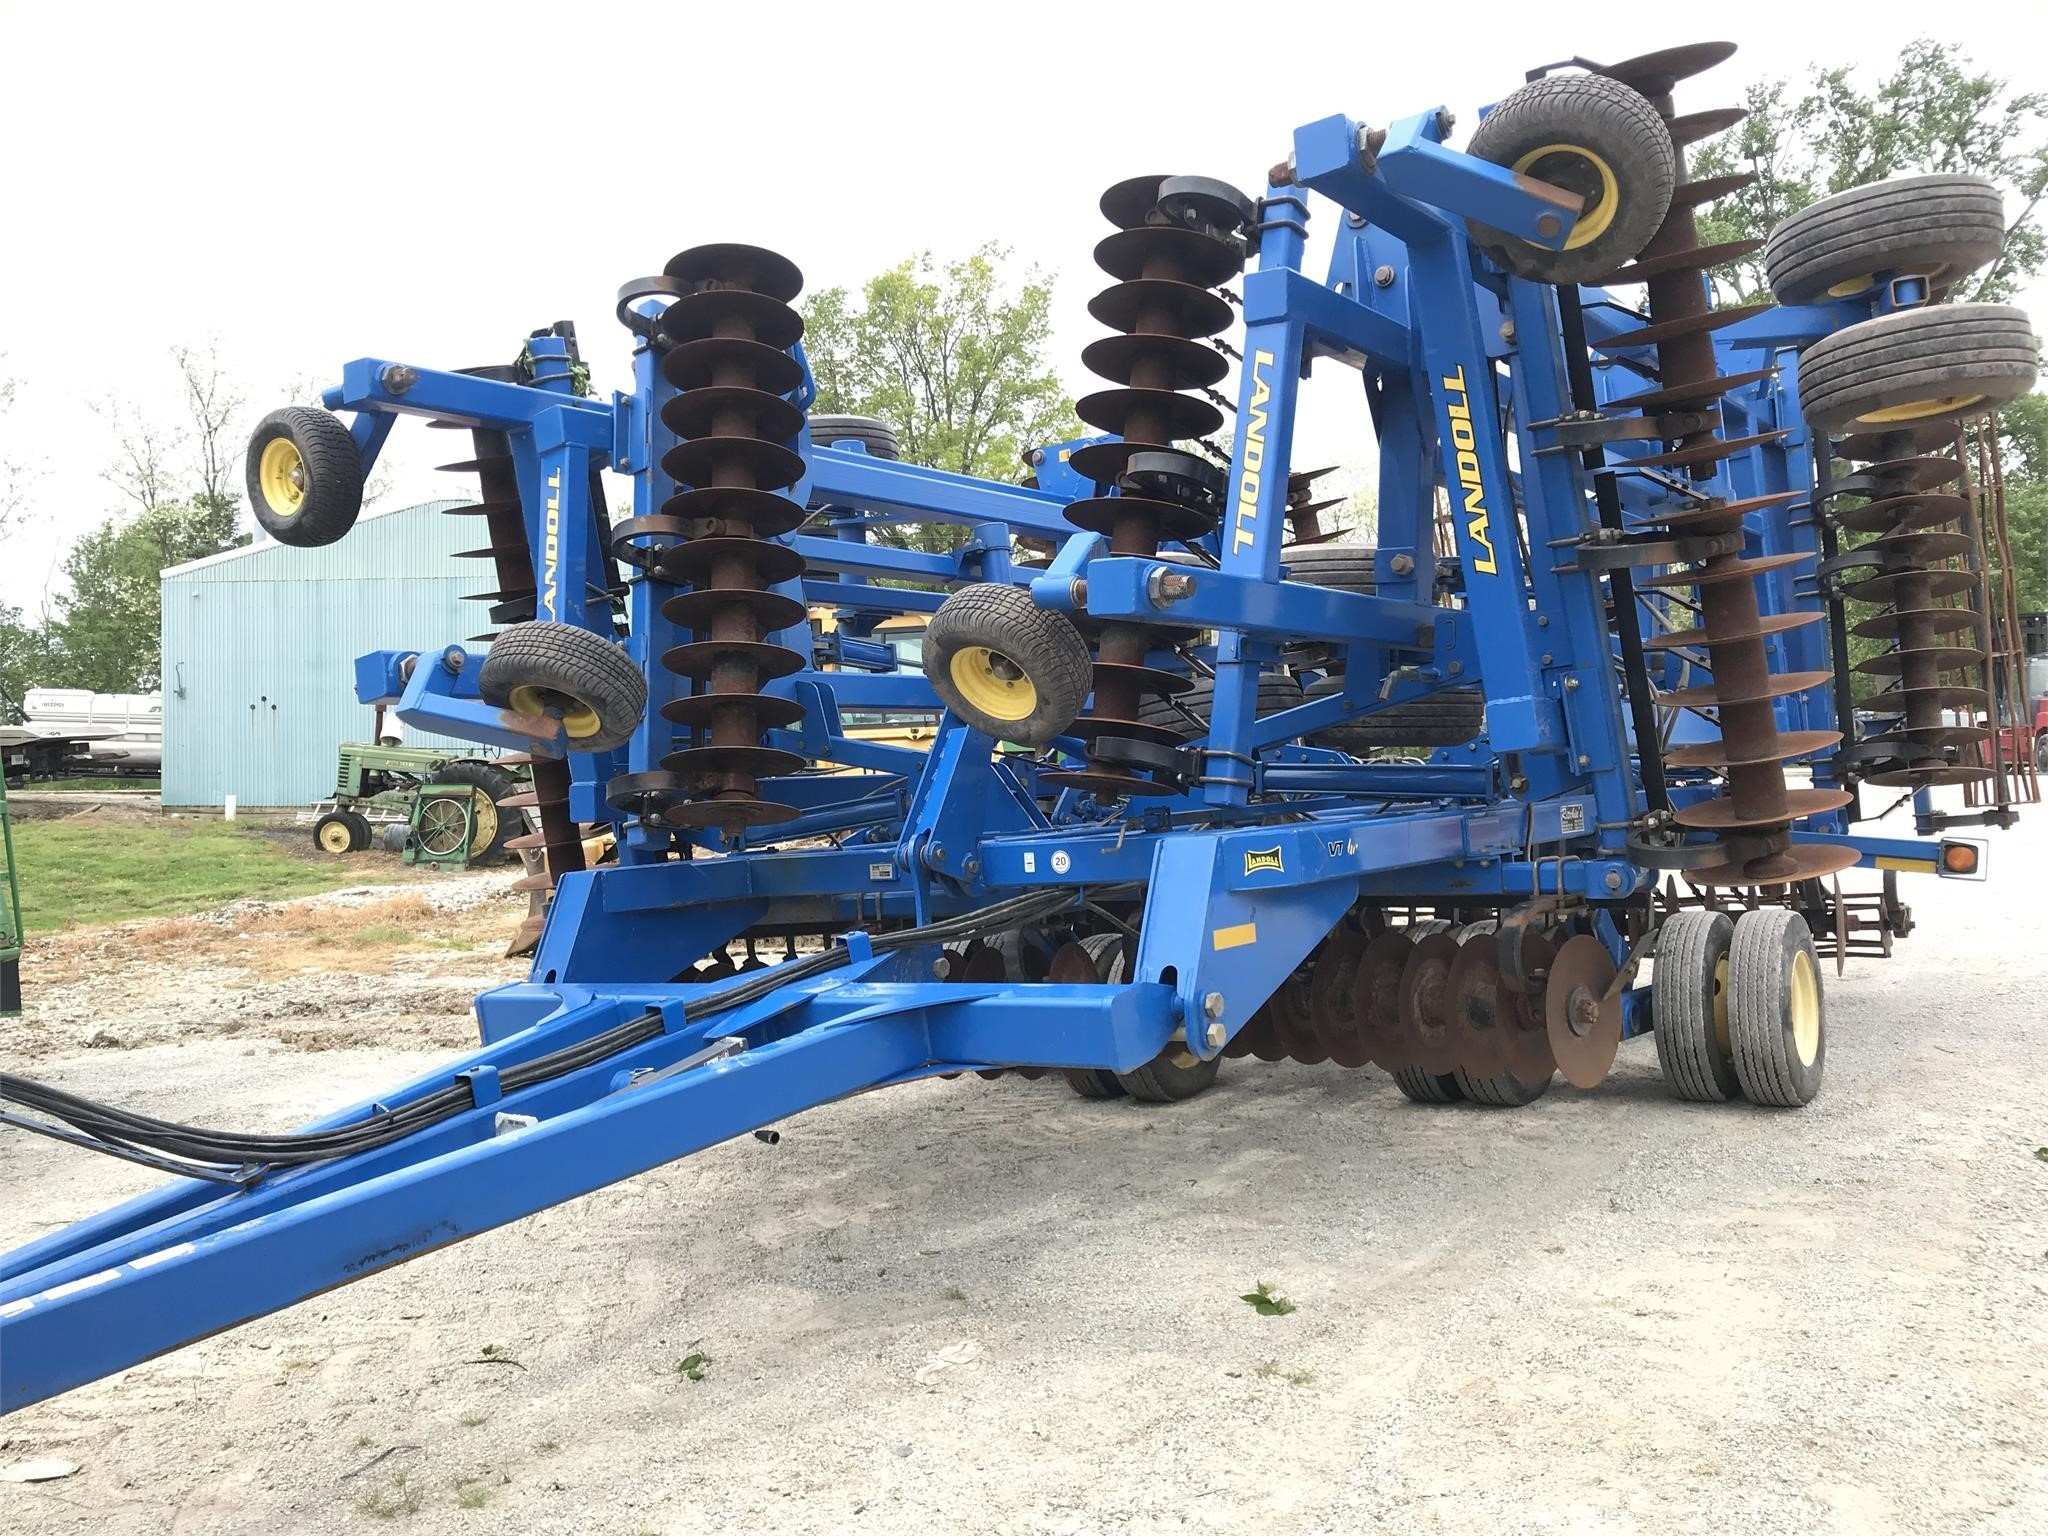 2012 Landoll 7450 VT Plus Vertical Tillage